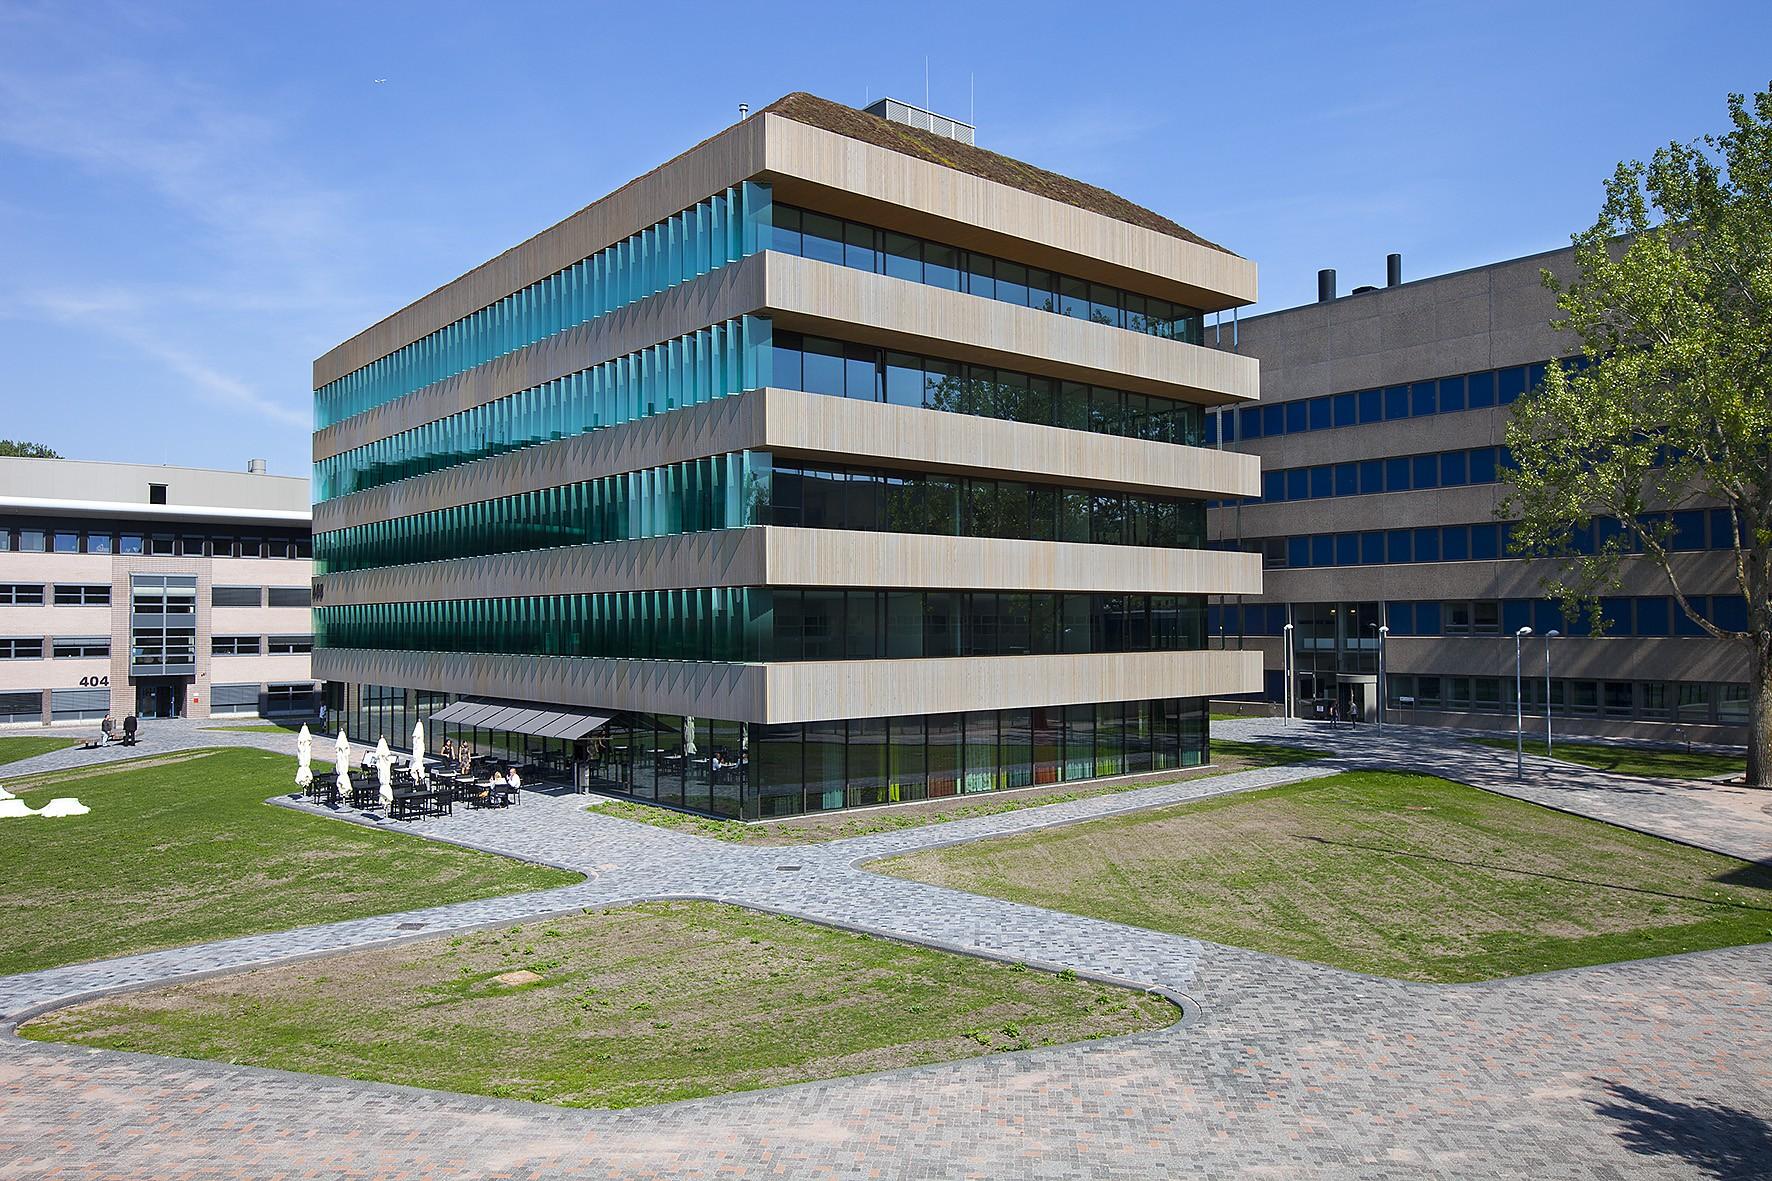 Amsterdam_Incubatorgebouw8